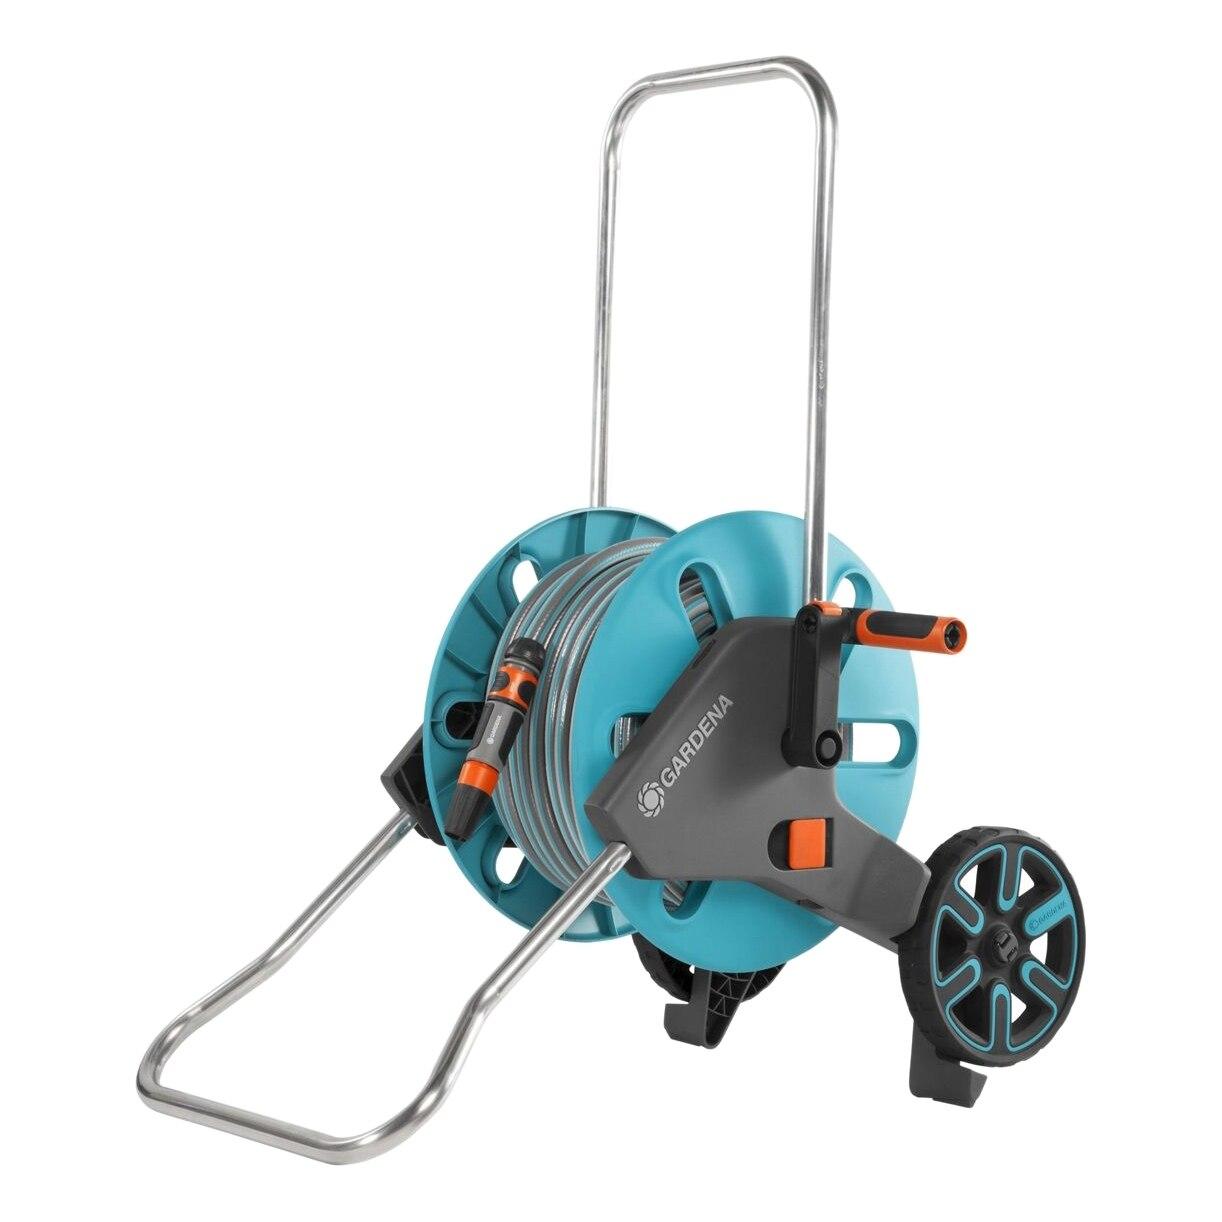 Set поливочный GARDENA 18512-20.000.00 (Protection from frost, adjustable height handle Kick & Stand function) стоимость